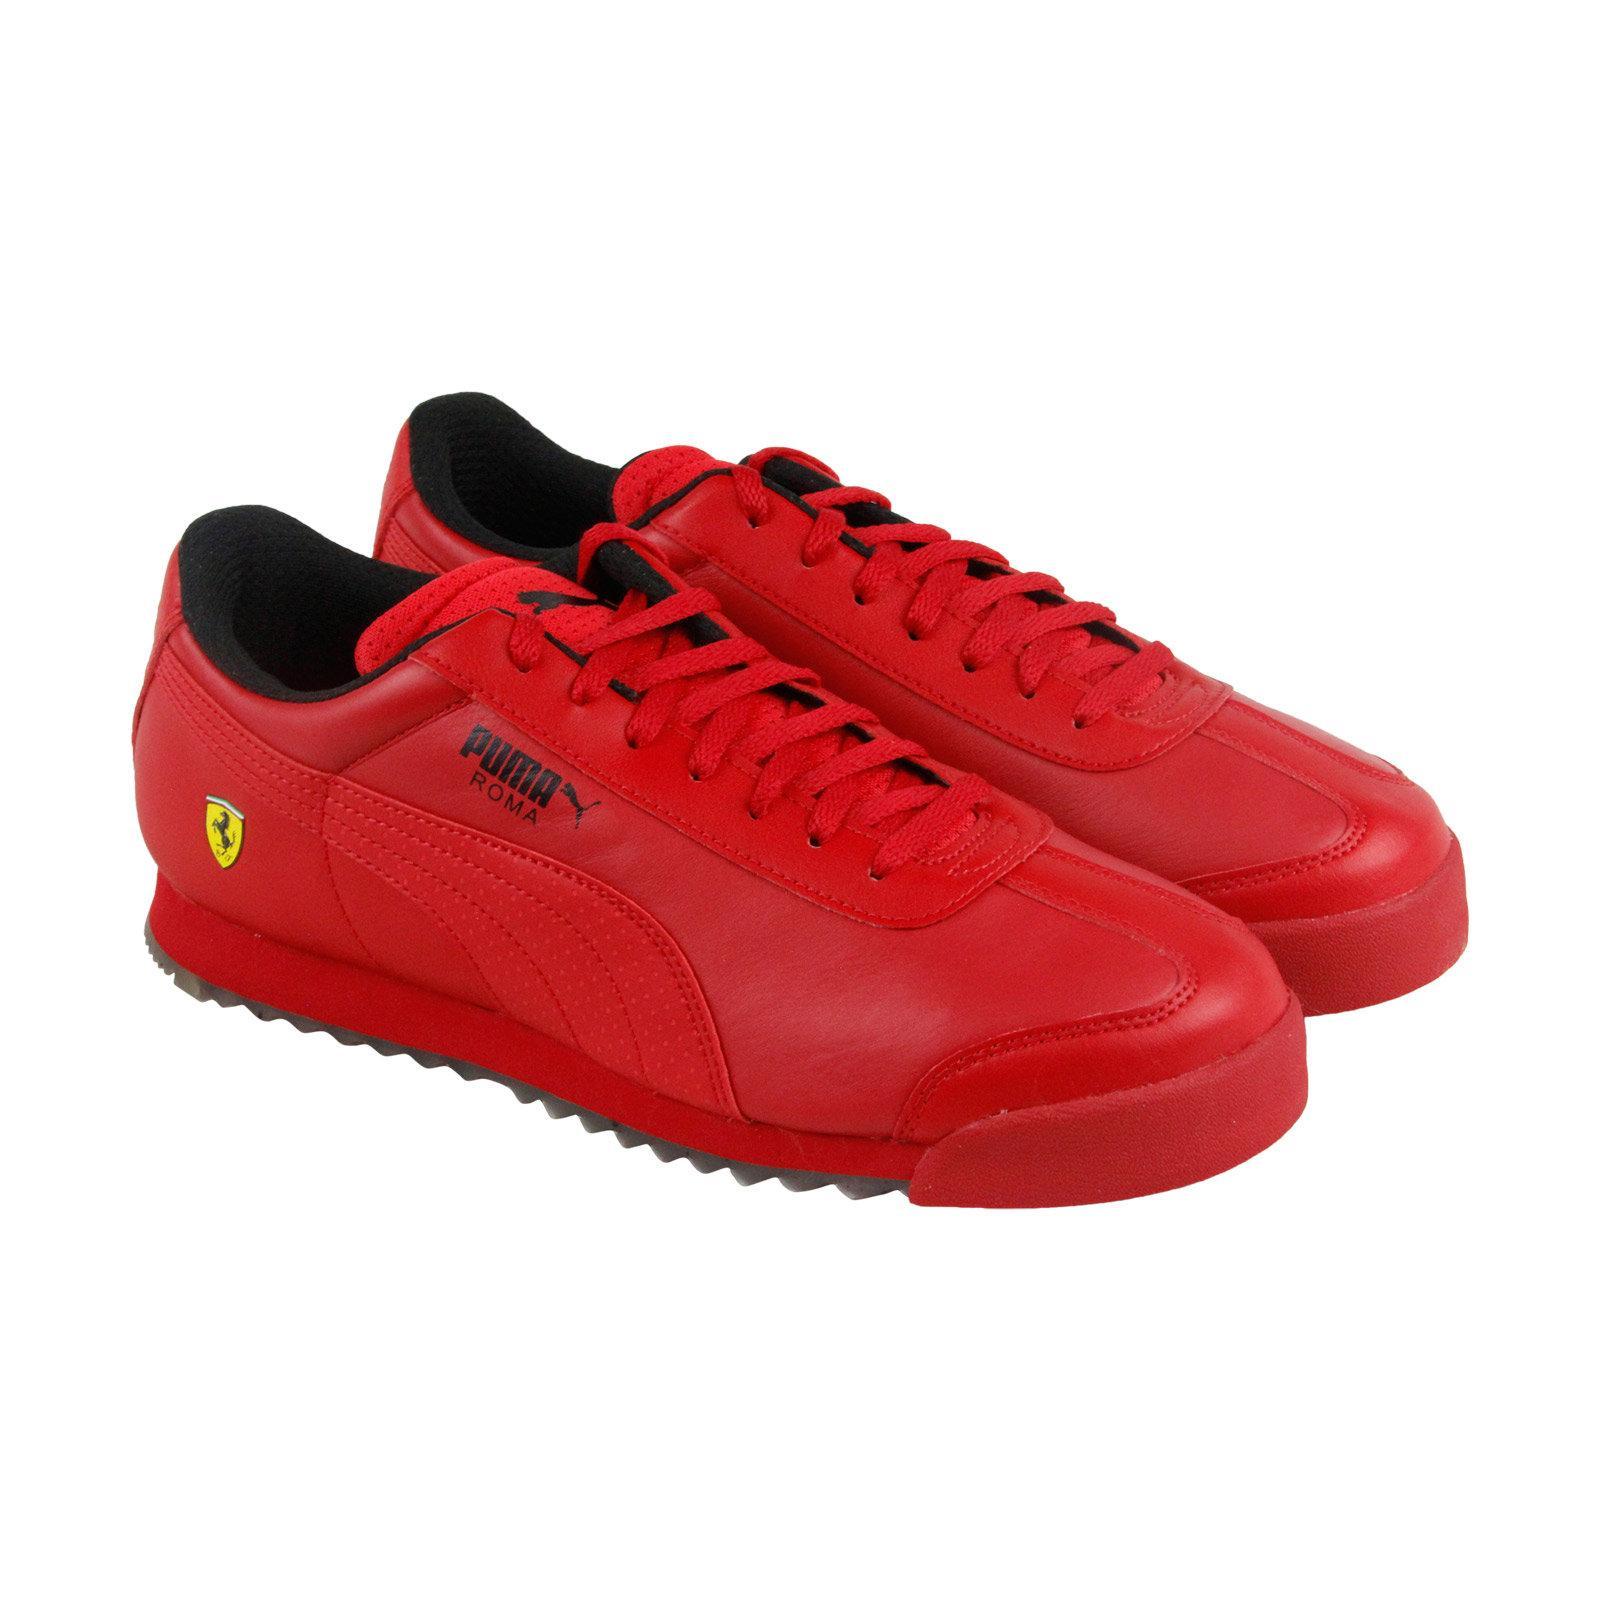 Puma sepatu casual Ferrari Roma - 30601101 - merah